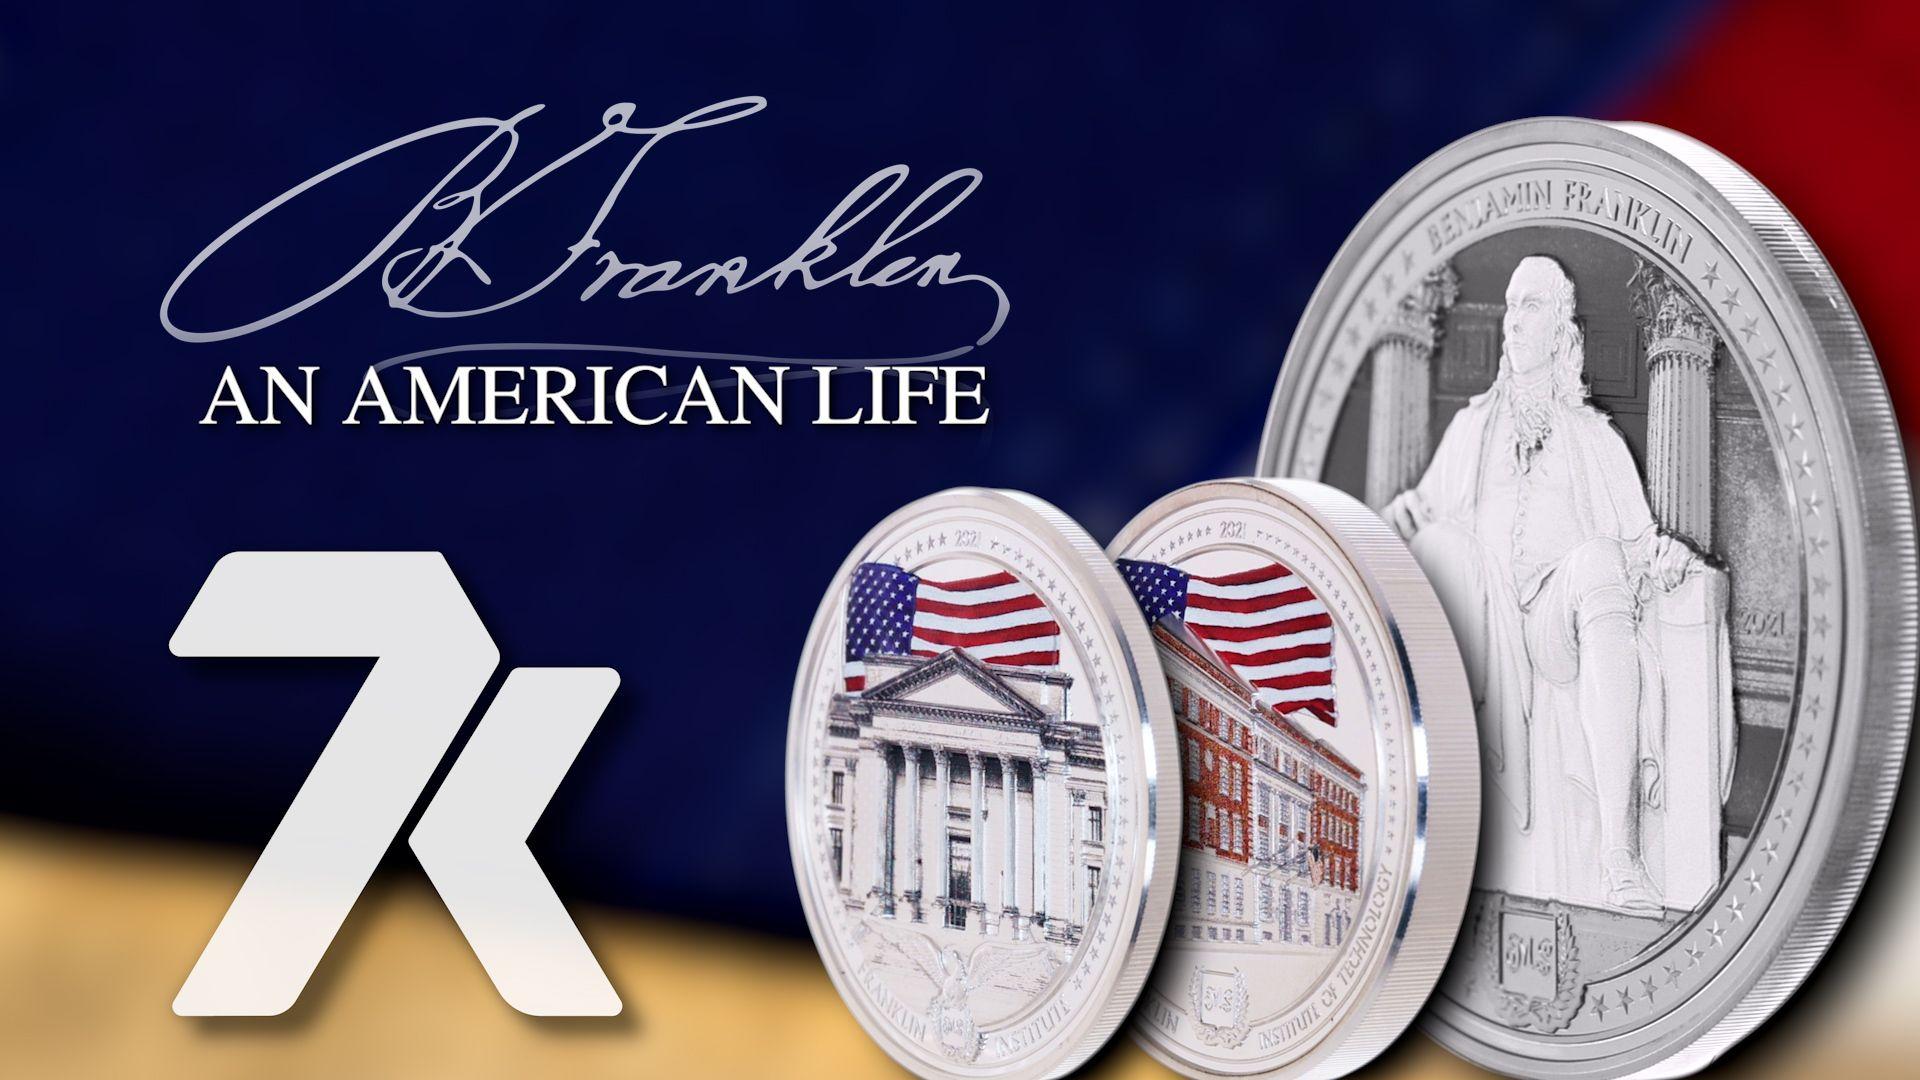 An American Life - Benjamin Franklin Coin Series